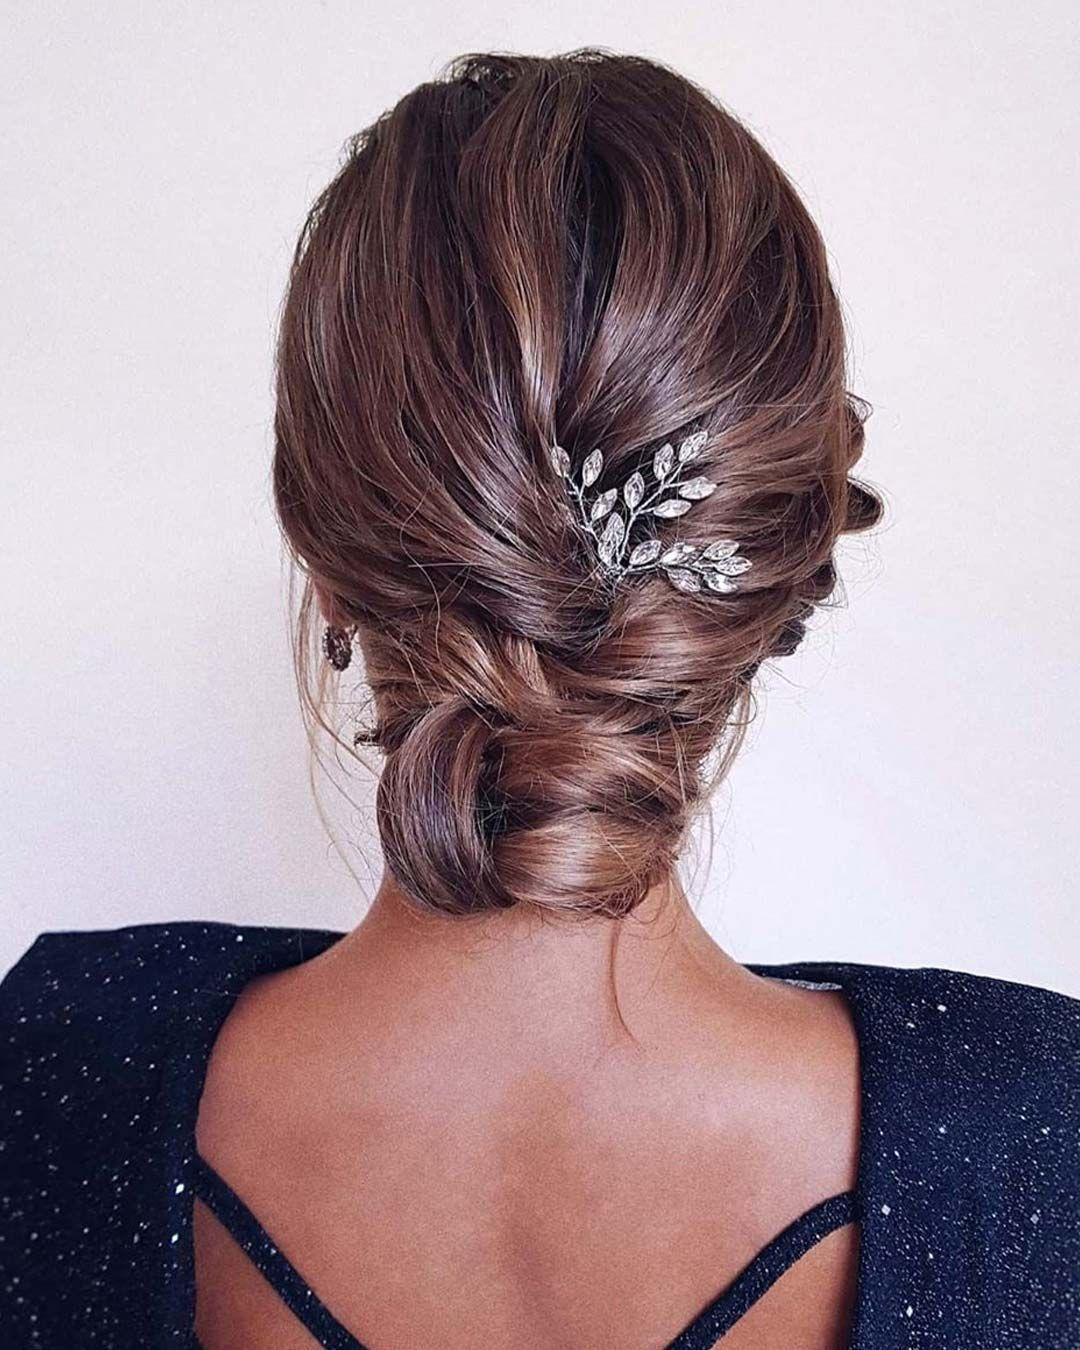 Wedding Hairstyles 2020 2021 Fantastic Hair Ideas In 2020 Hair Styles Wedding Hair Inspiration Short Wedding Hair